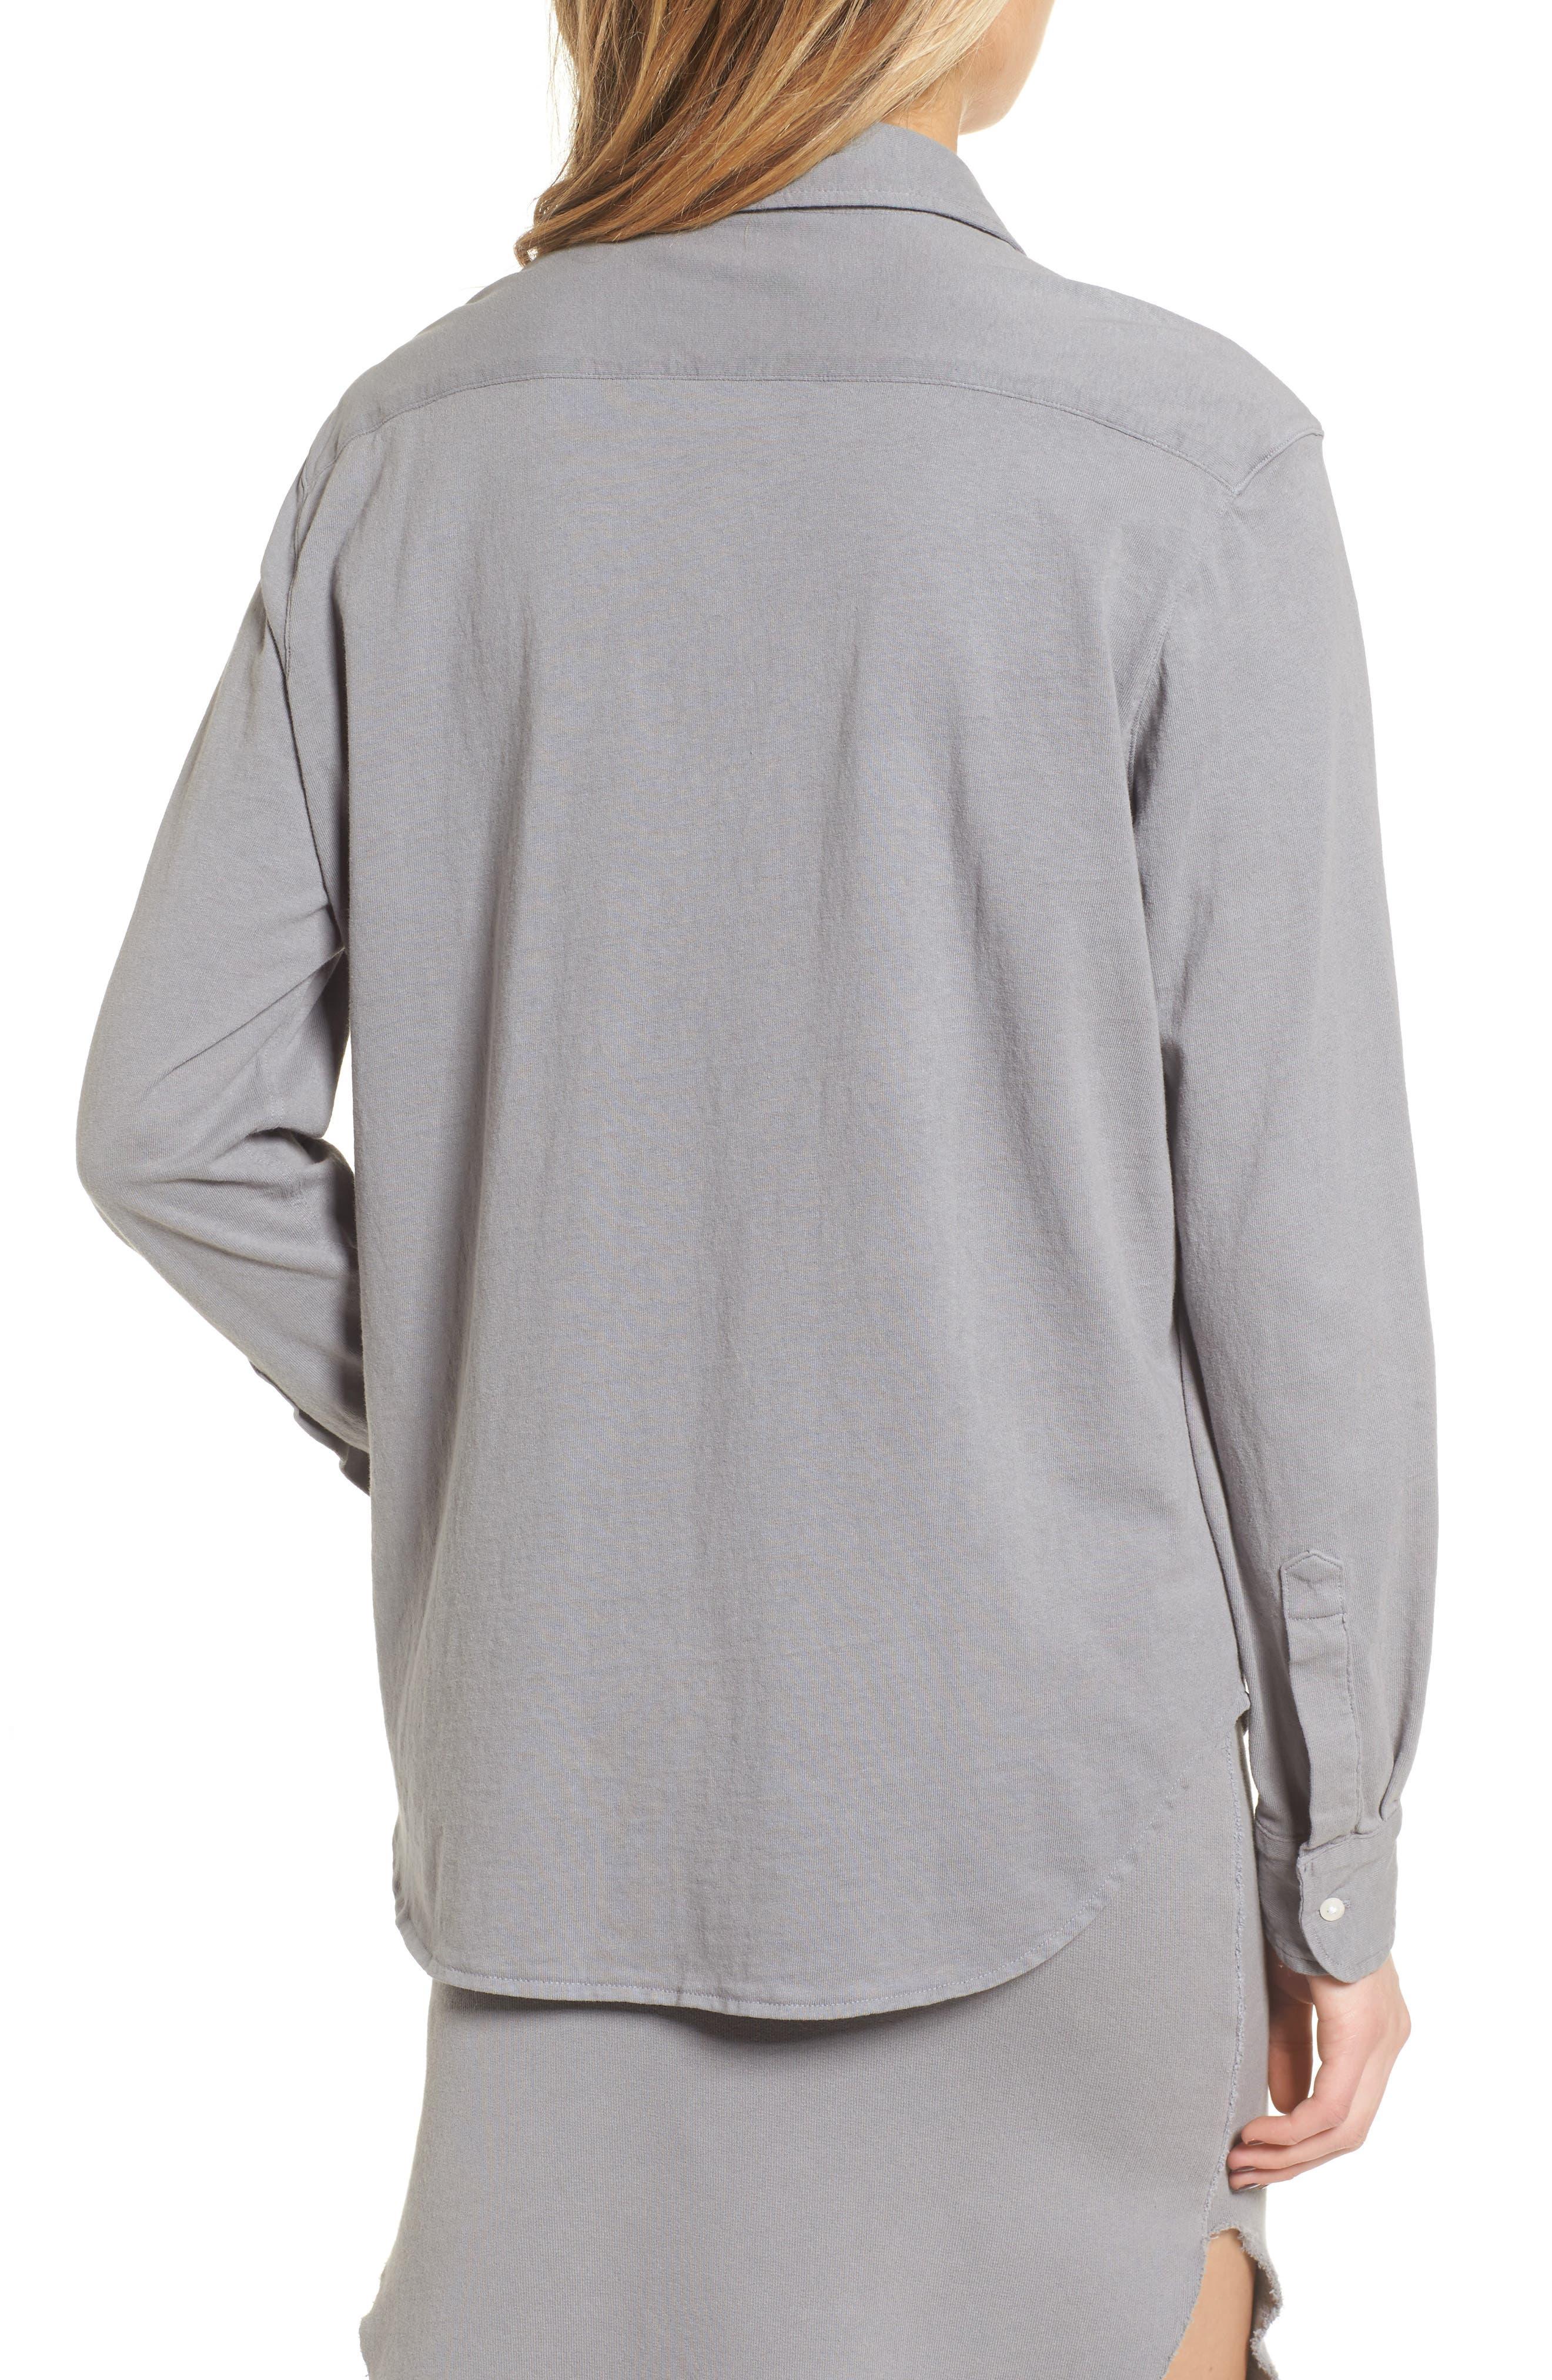 Tee Lab Knit Button Down Shirt,                             Alternate thumbnail 2, color,                             Shadow